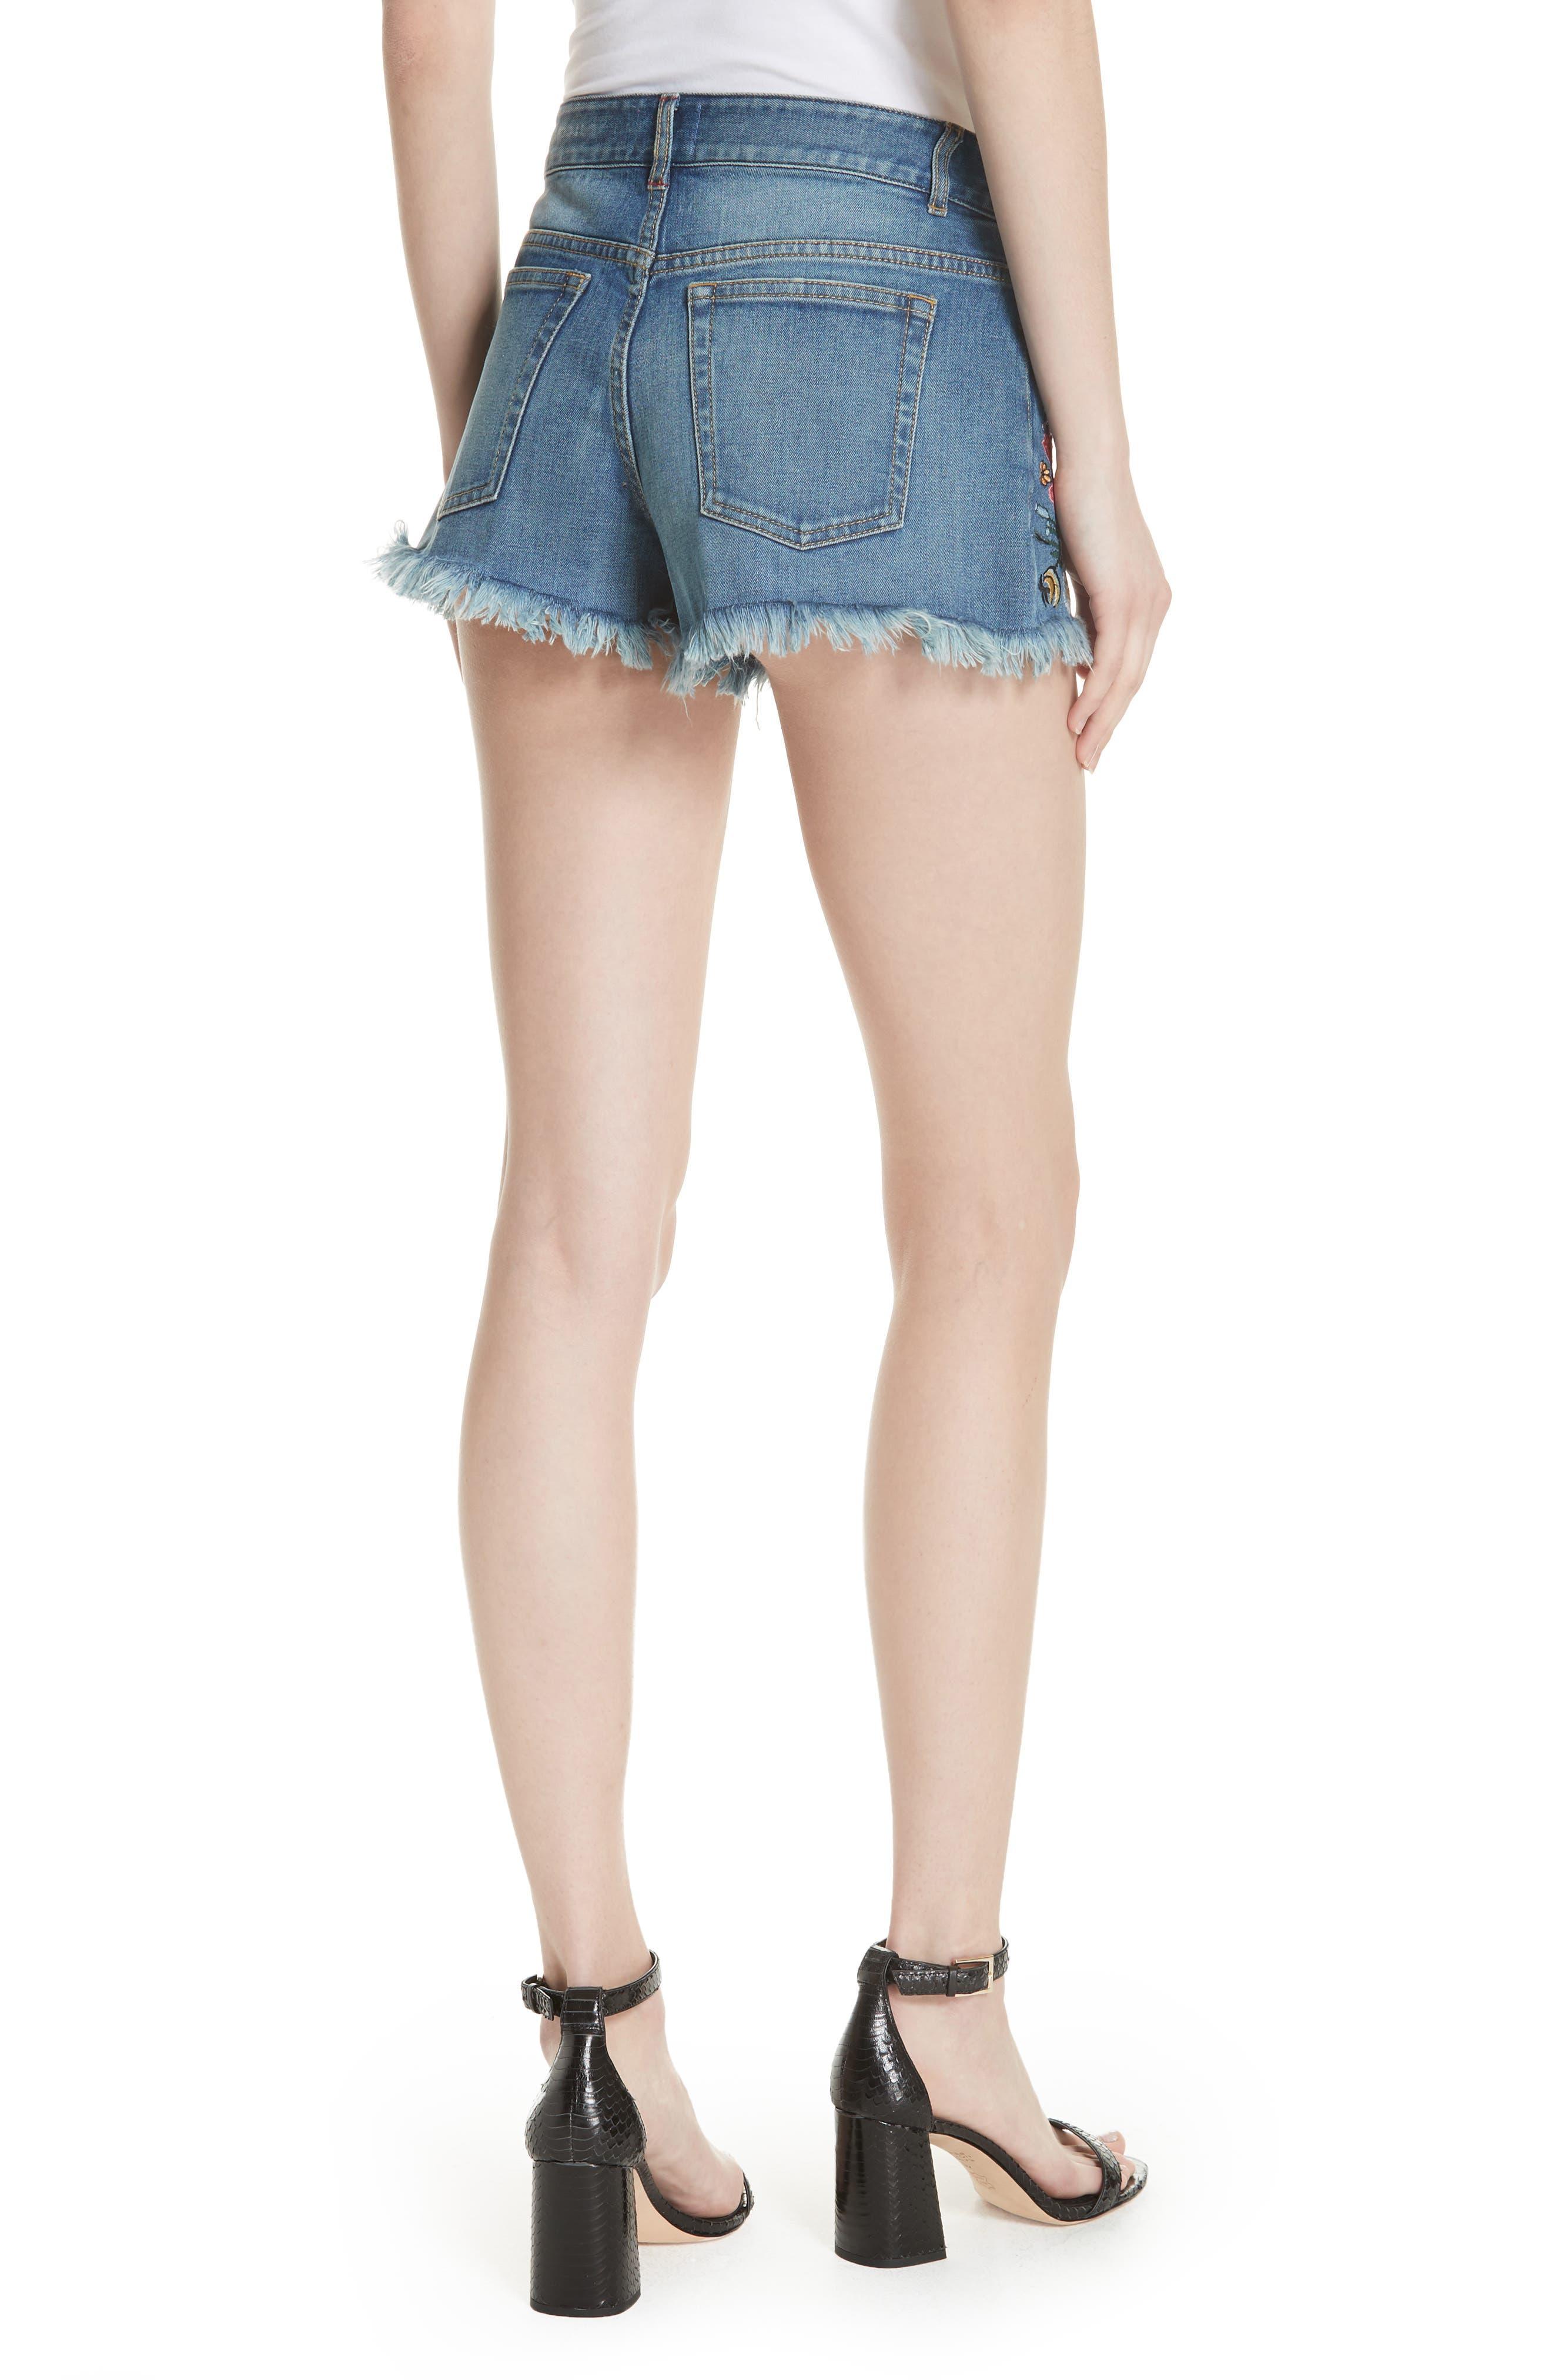 AO.LA Embroidered Denim Shorts,                             Alternate thumbnail 2, color,                             Multi